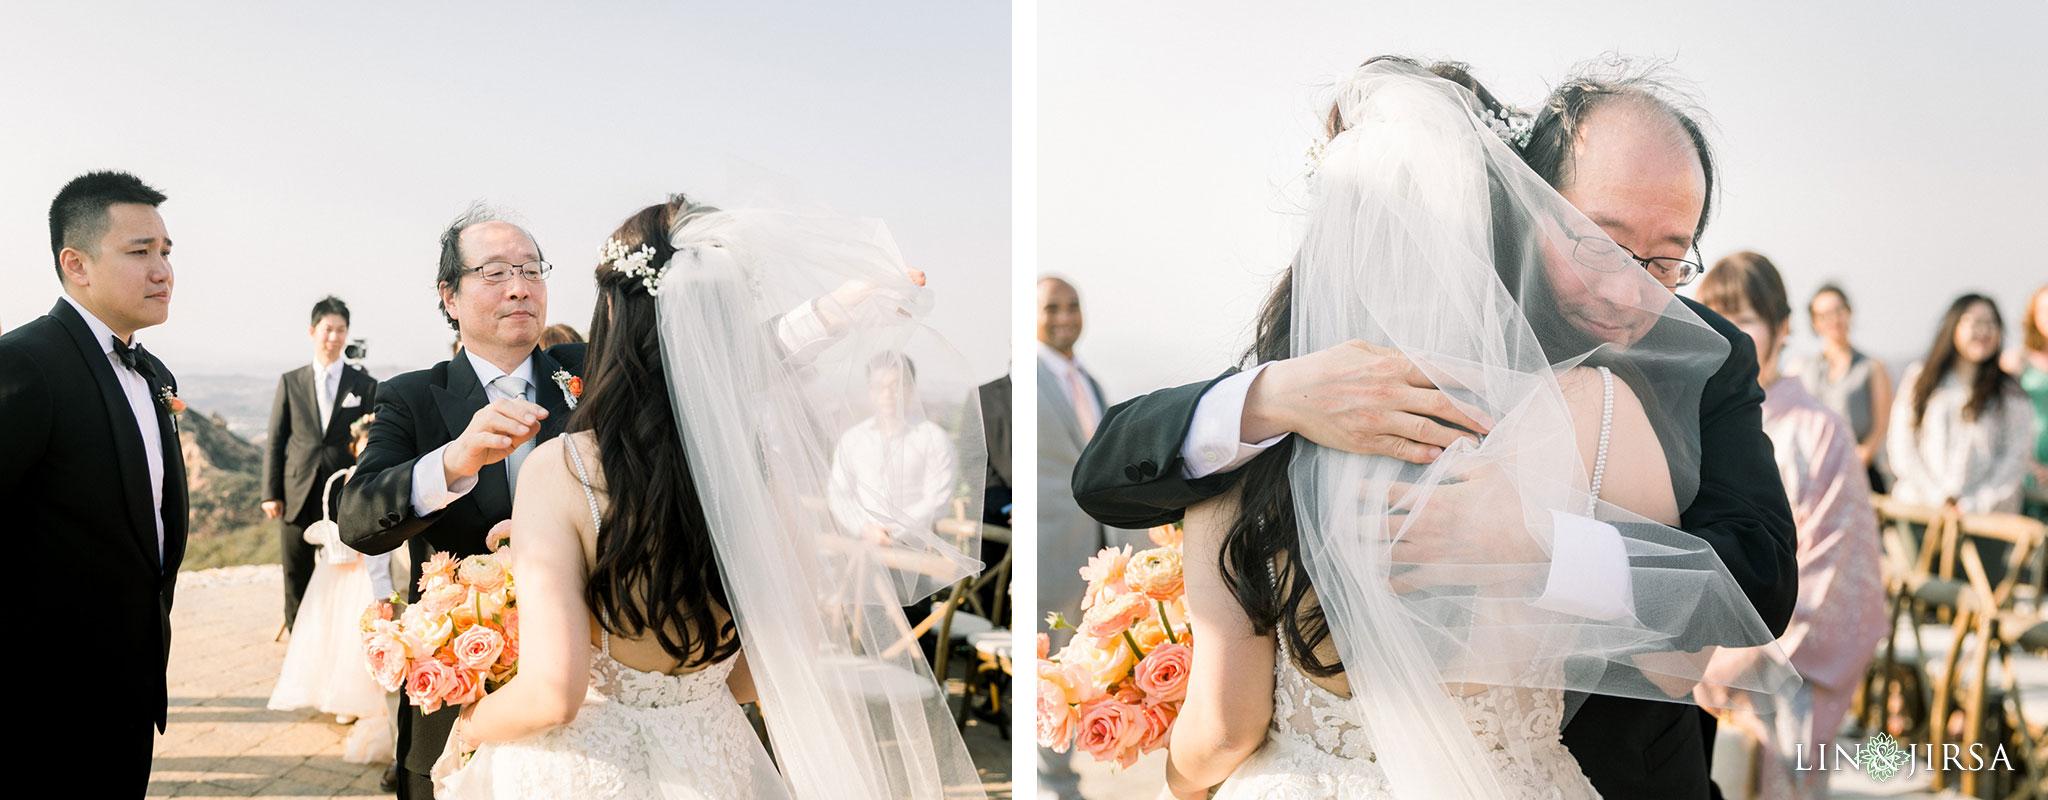 026 malibu rocky oaks filmic wedding photography